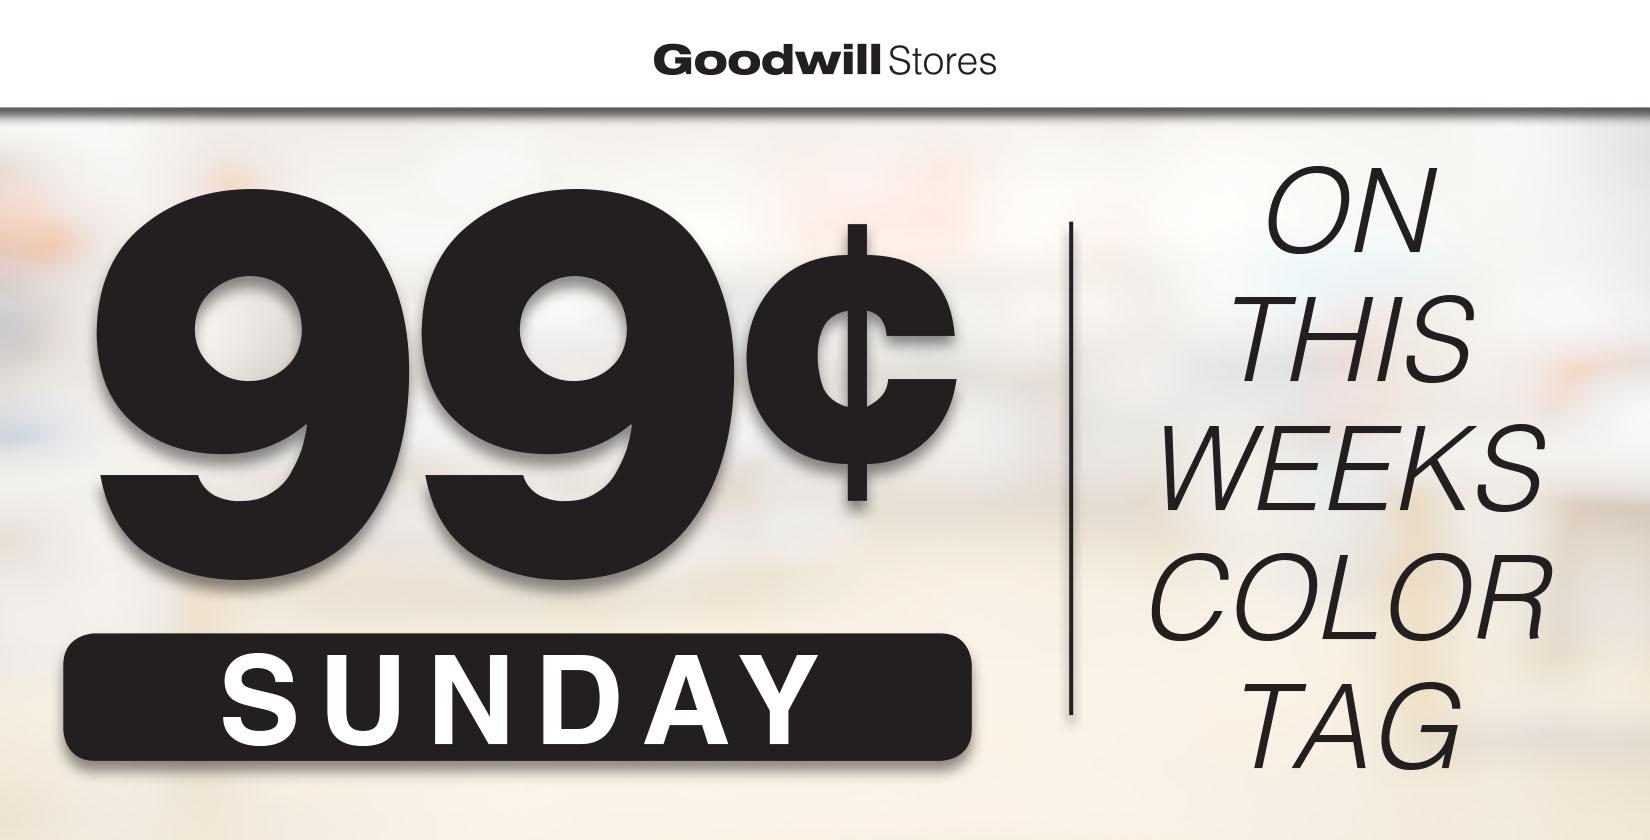 99¢ Sundays